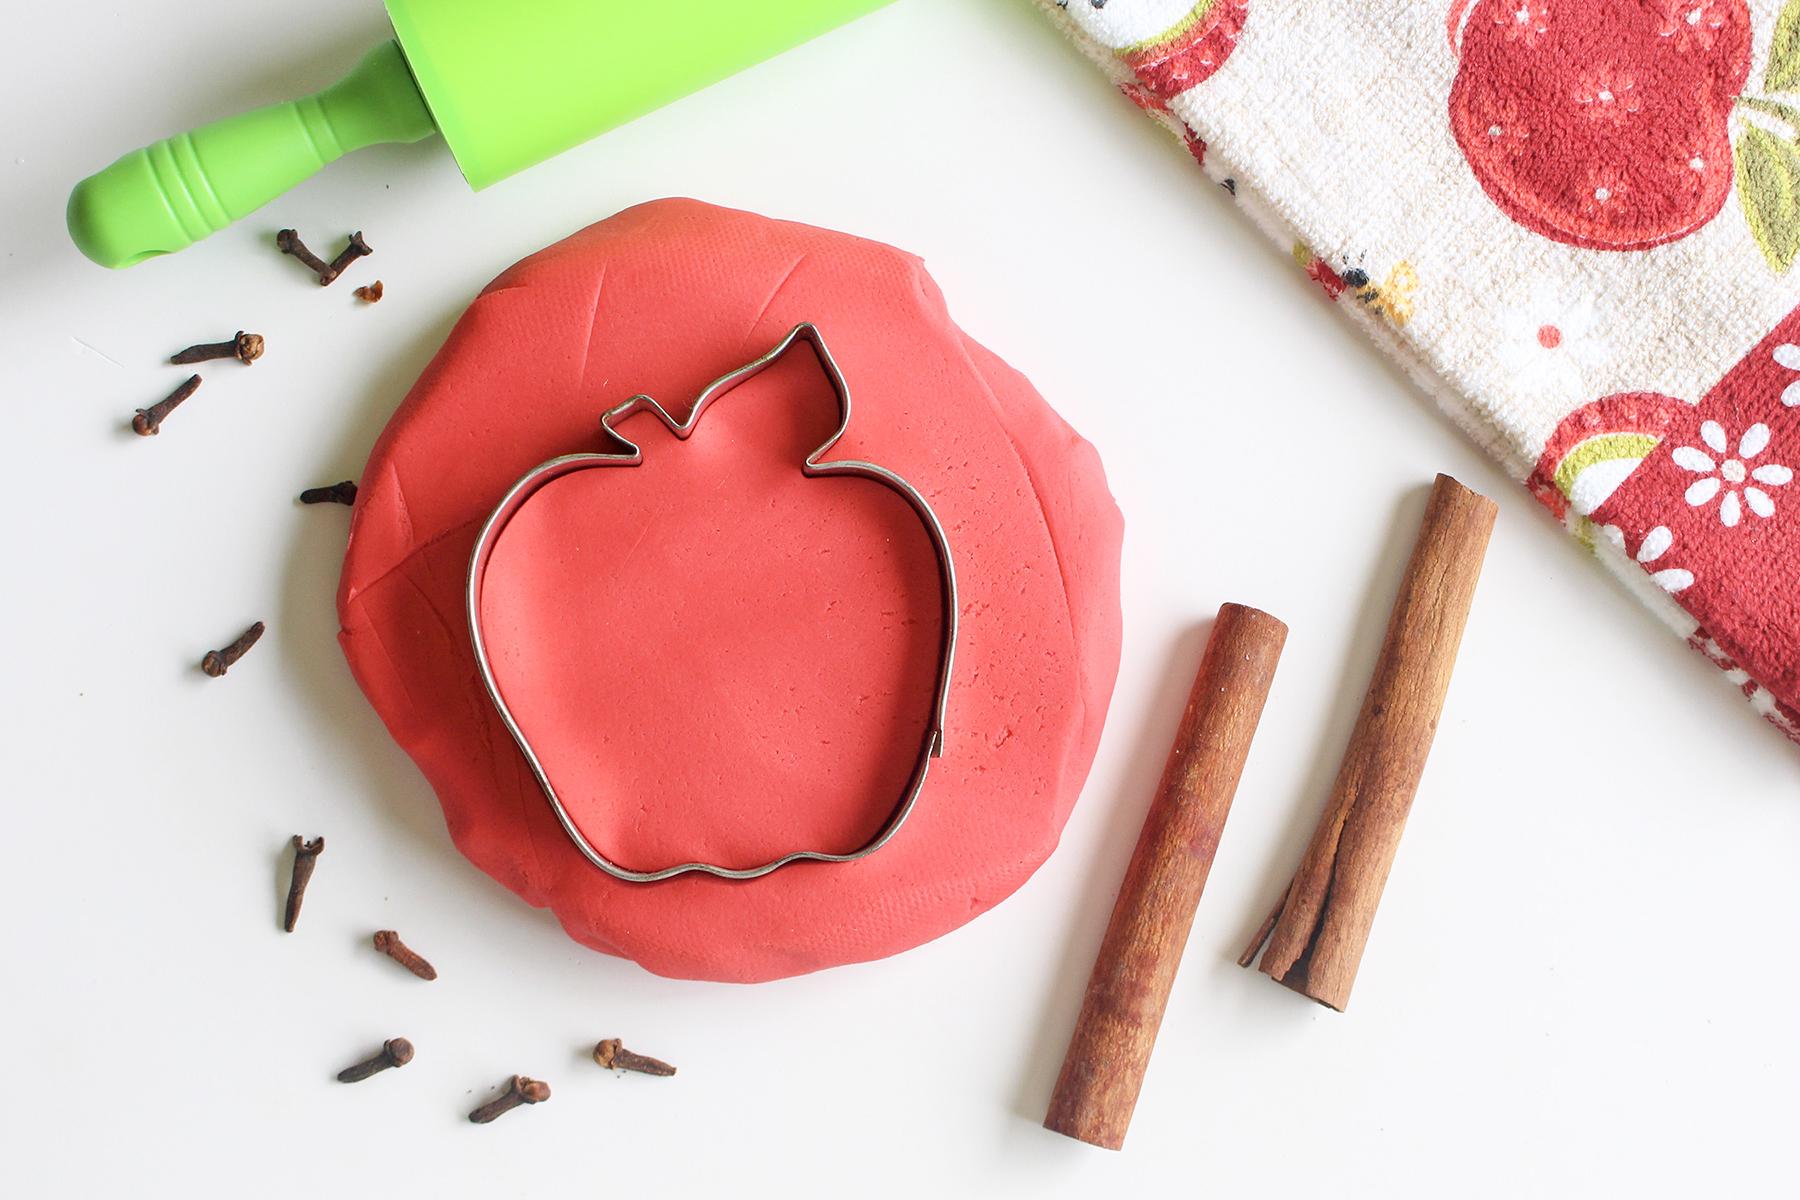 Apple Cider Homemade Playdough